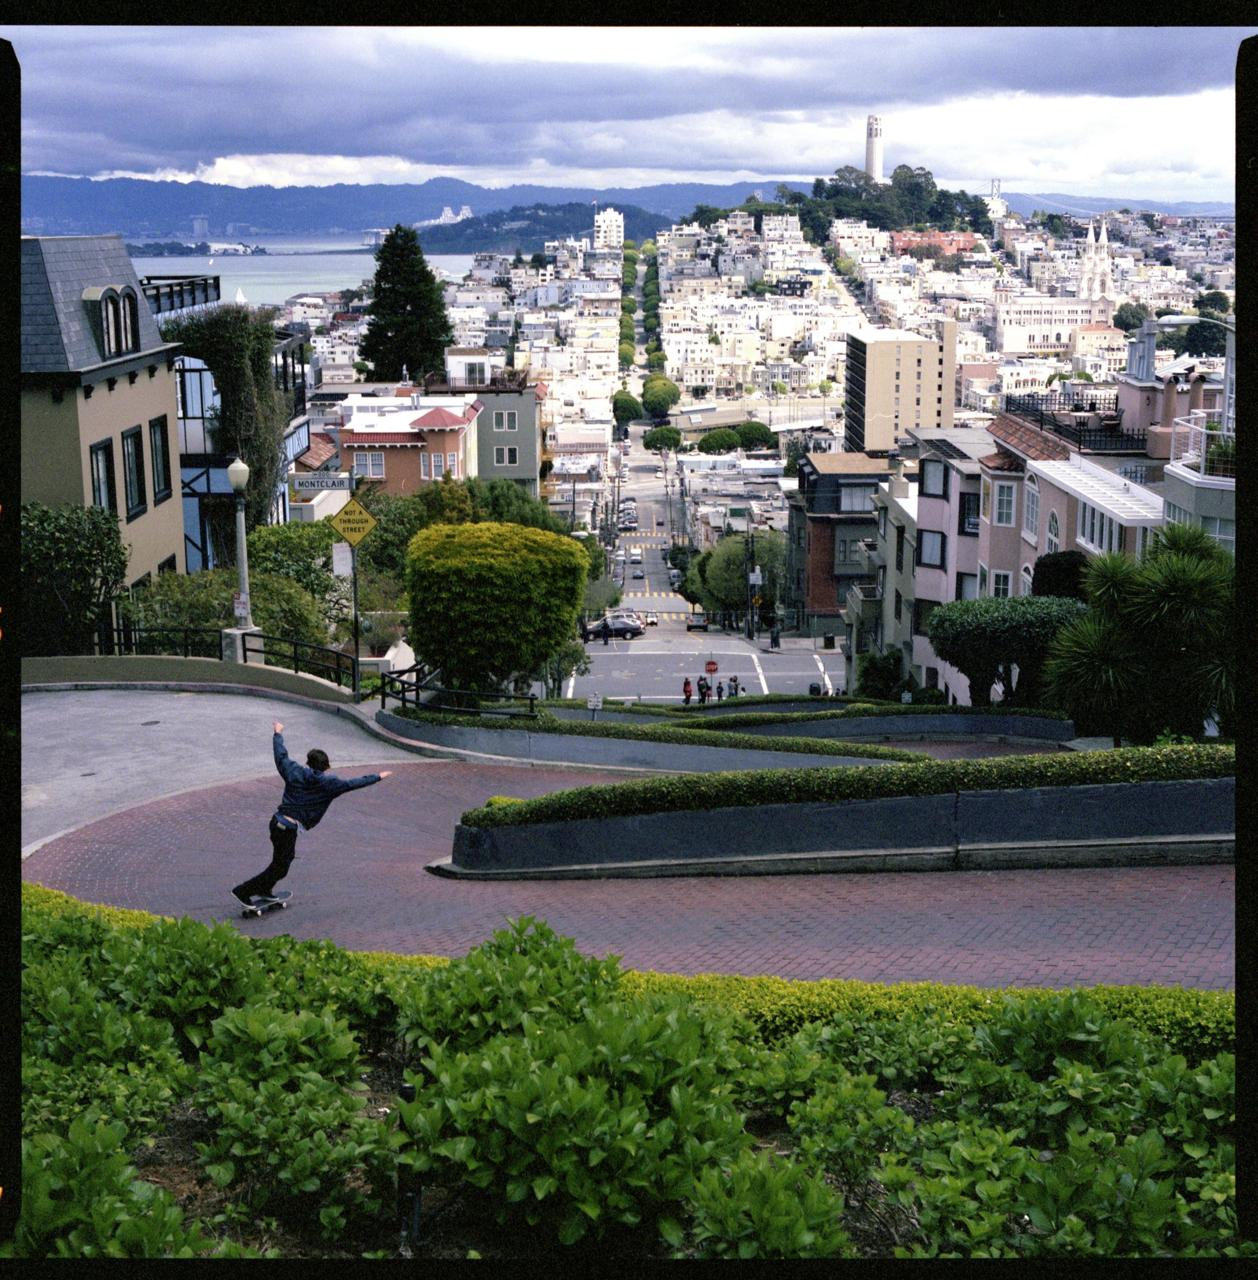 San Francisco: Places To Go: San Francisco, CA